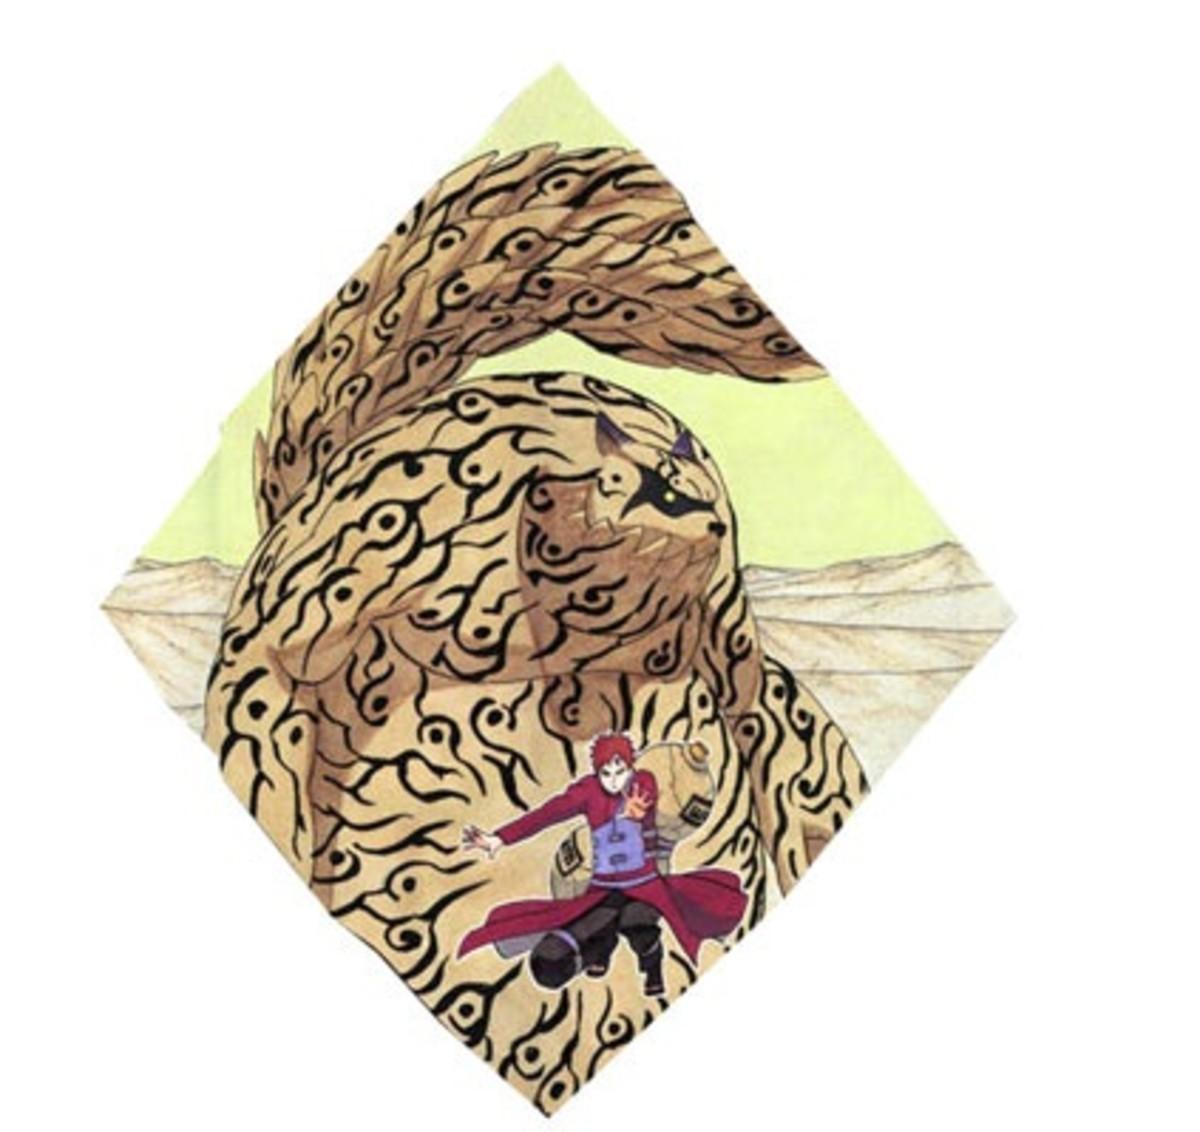 Shukaku, the one-tailed Tanuki